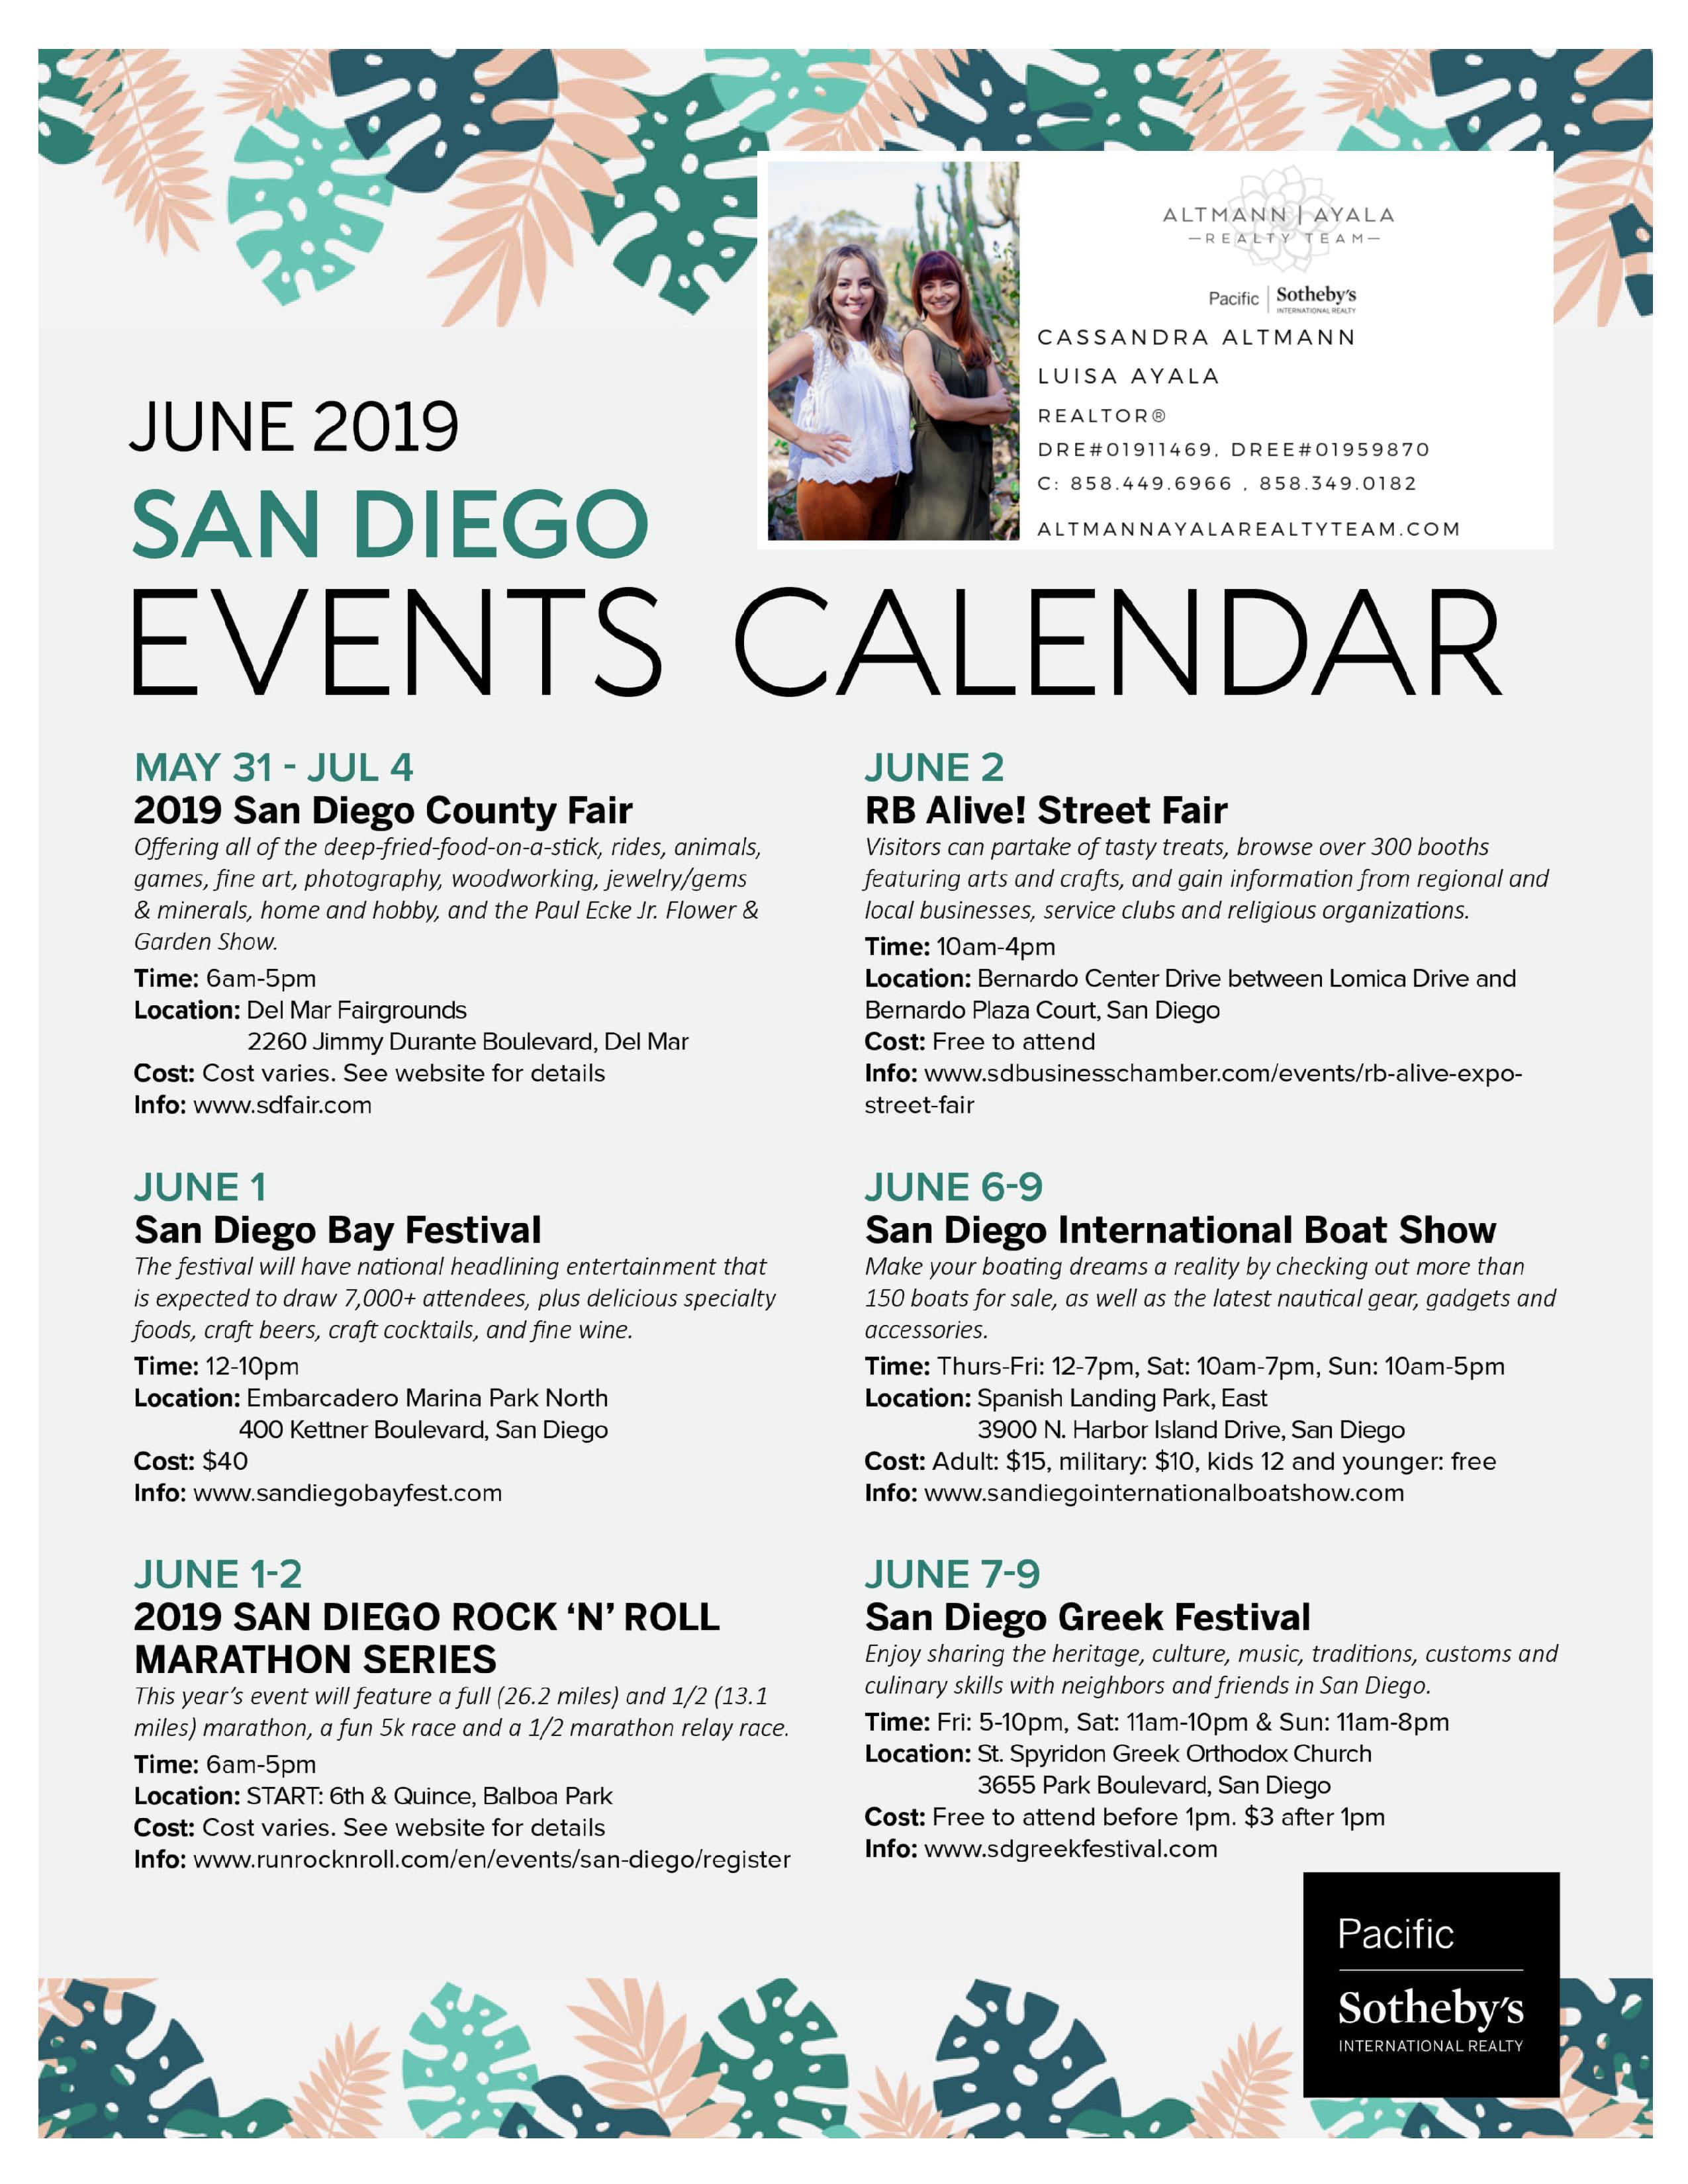 June 2019 San Diego Events Calendar